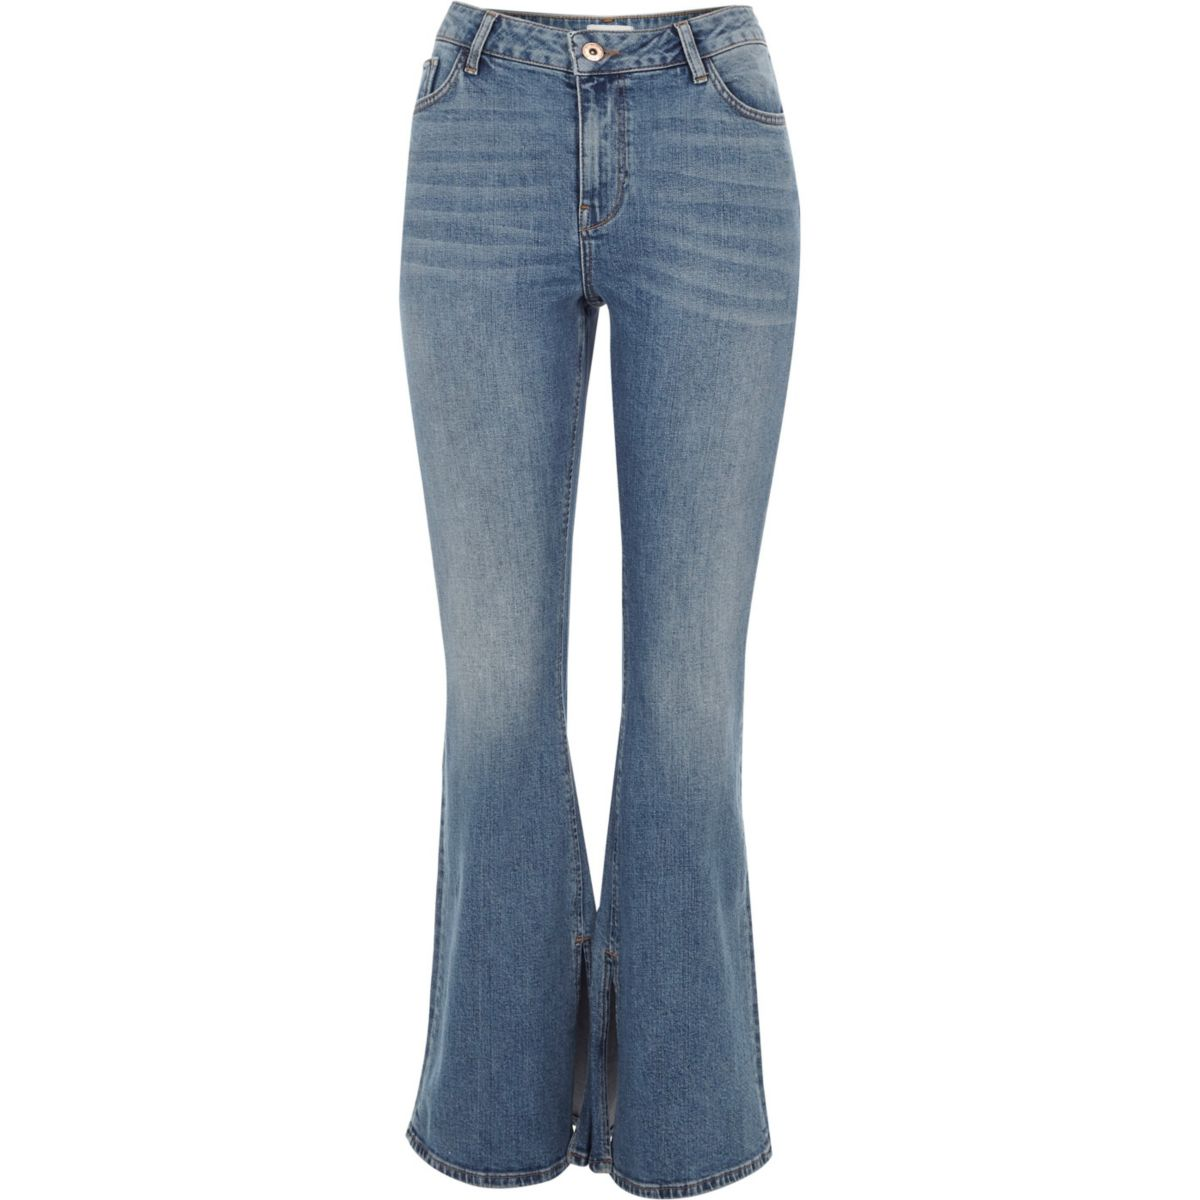 jeans Petite Petite blue wash Petite wash flared blue flared jeans Bqtxd